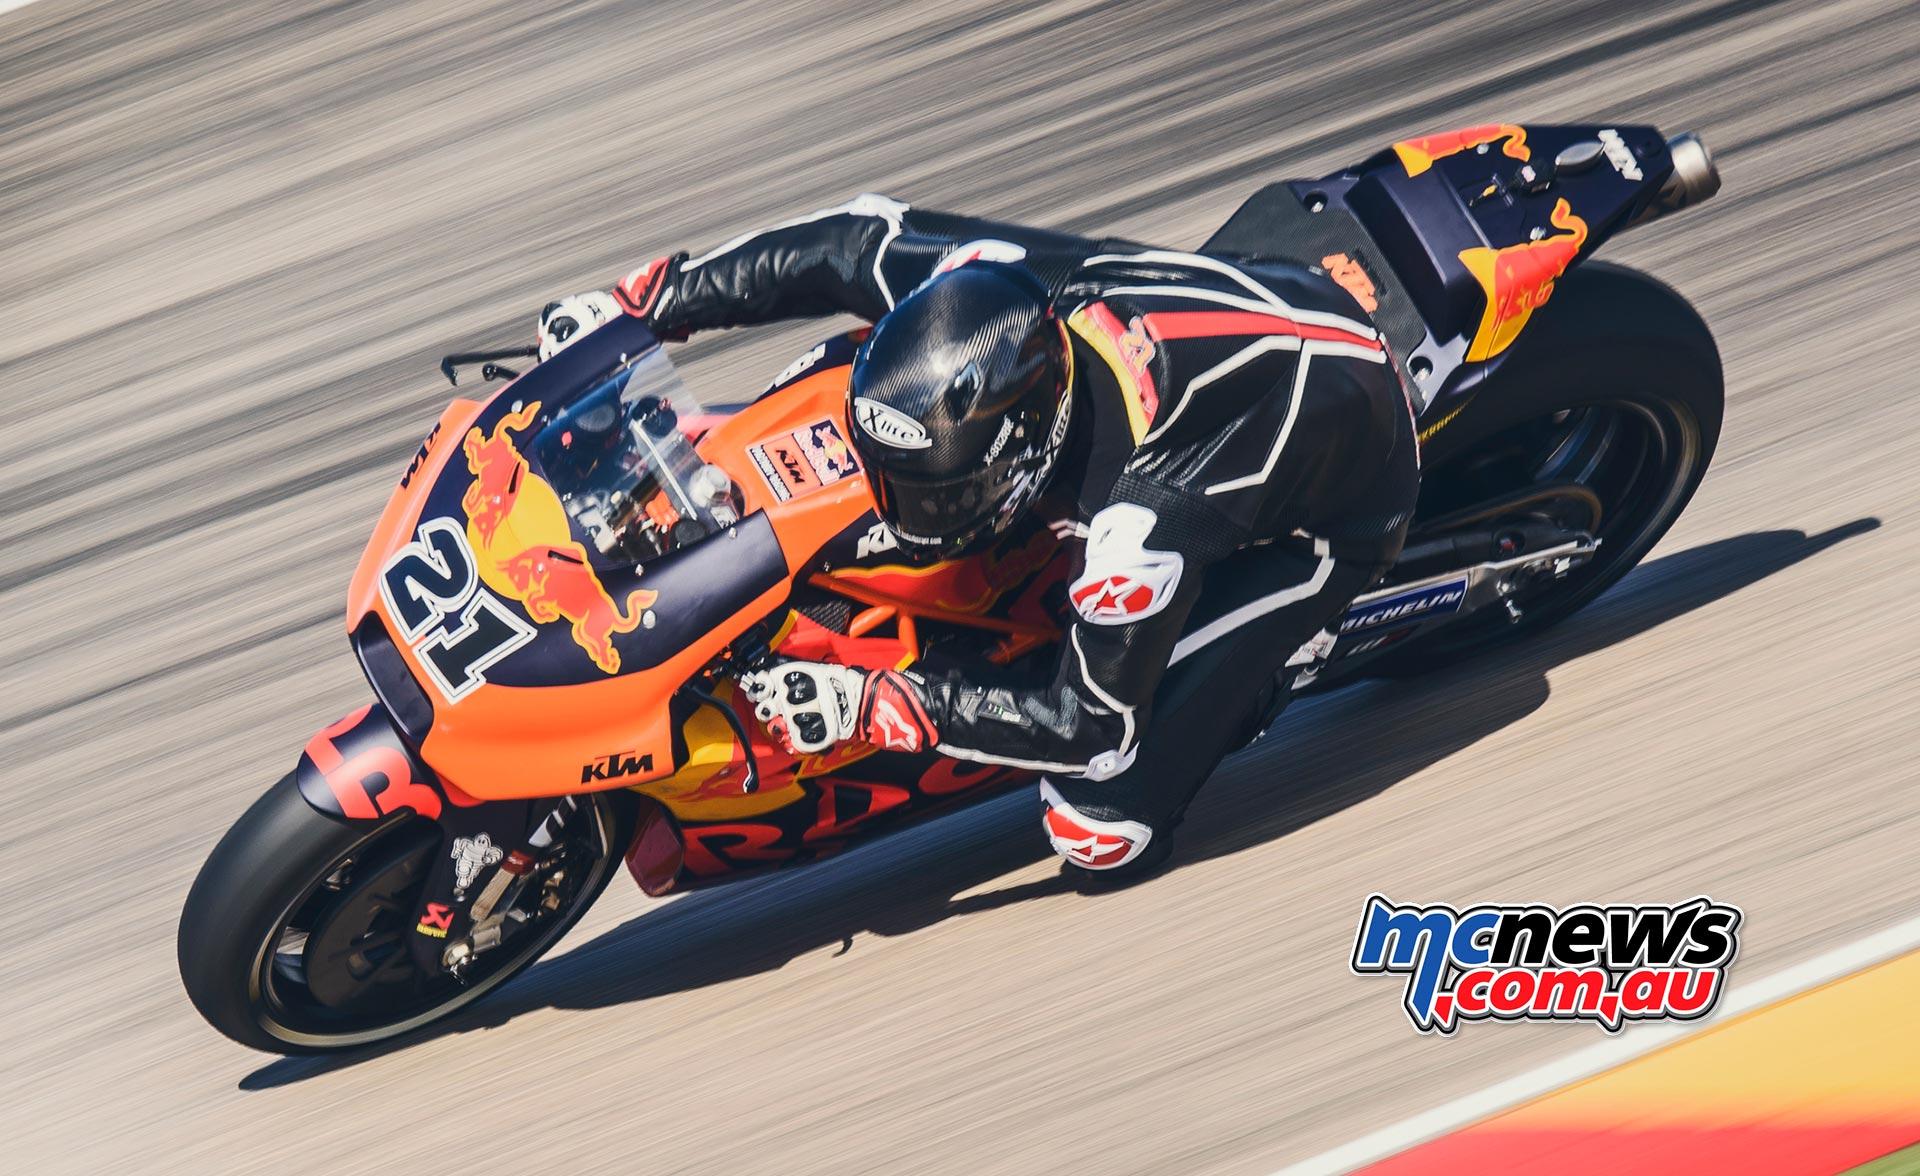 Valentino Rossi | 2016 MotoGP Livery | Motorcycle News